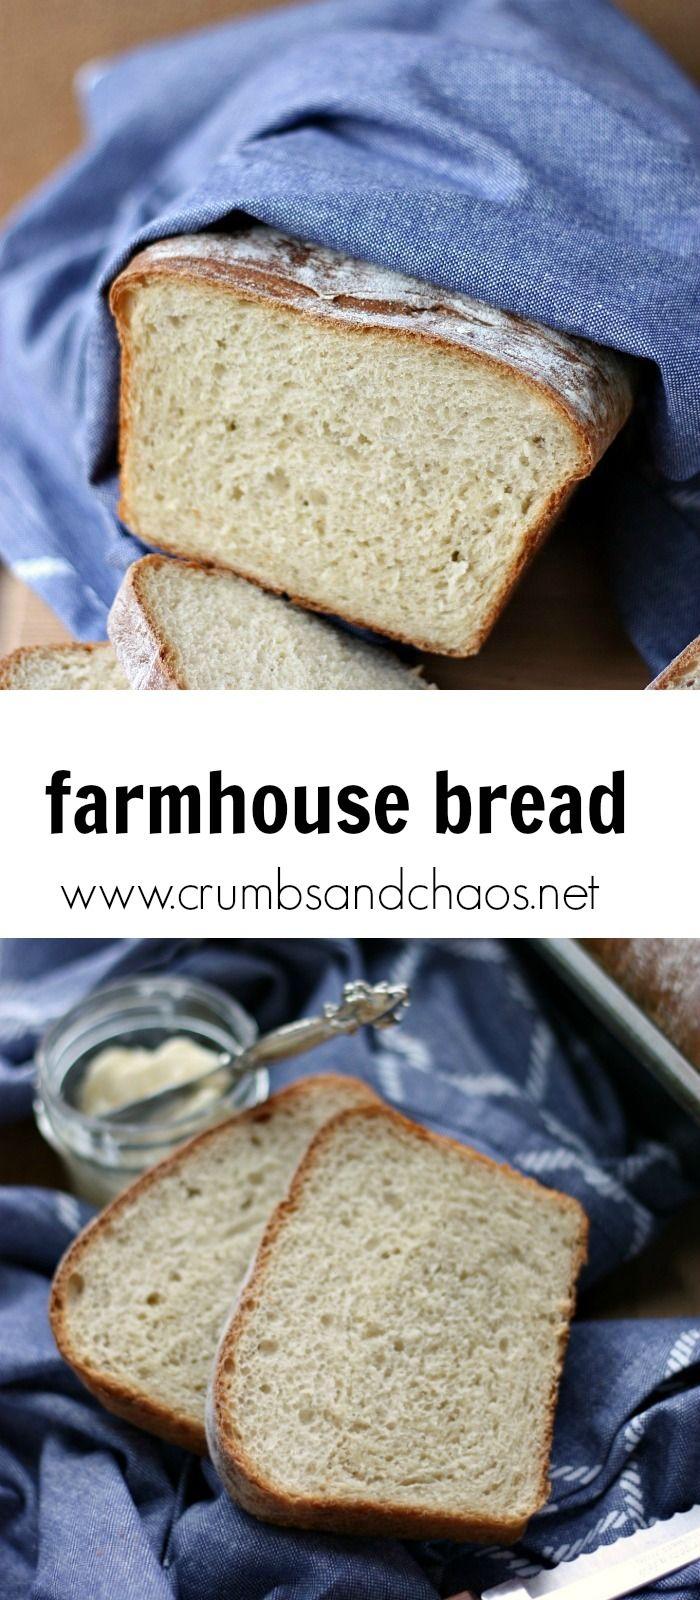 Farmhouse Bread Recipe Farmhouse bread recipe, Bread